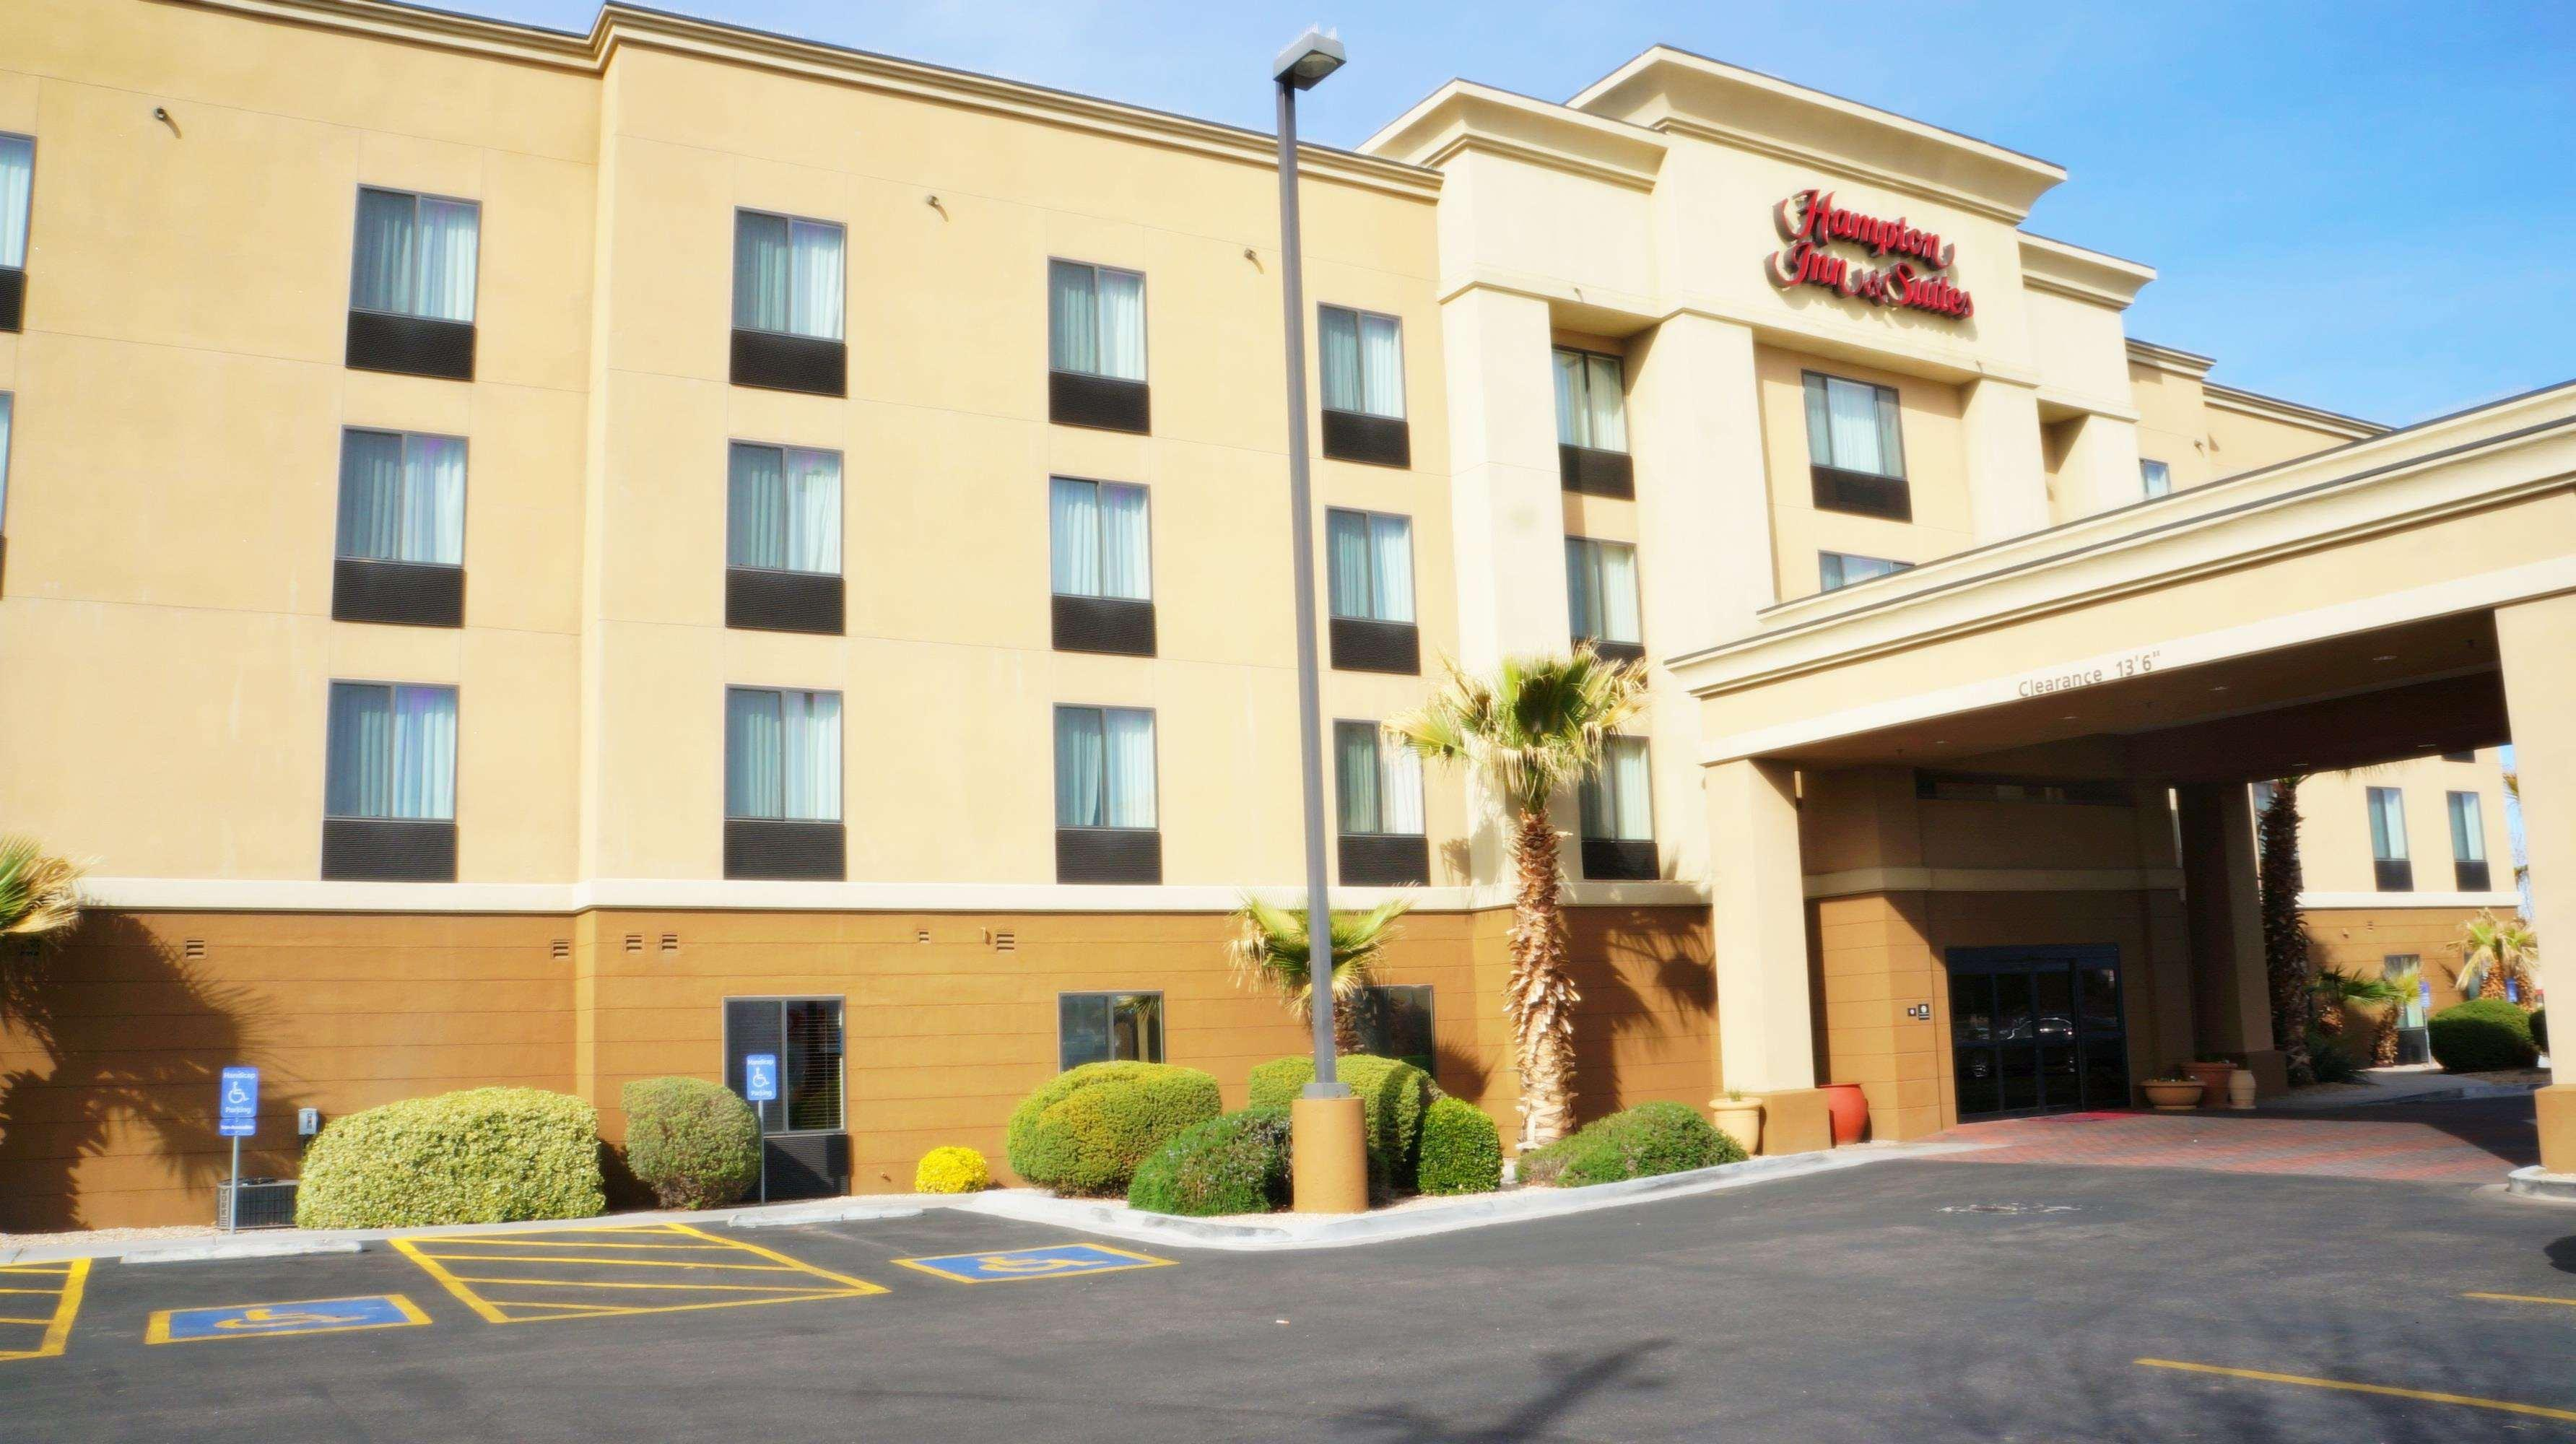 Hampton Inn And Suites Kingman, Mohave